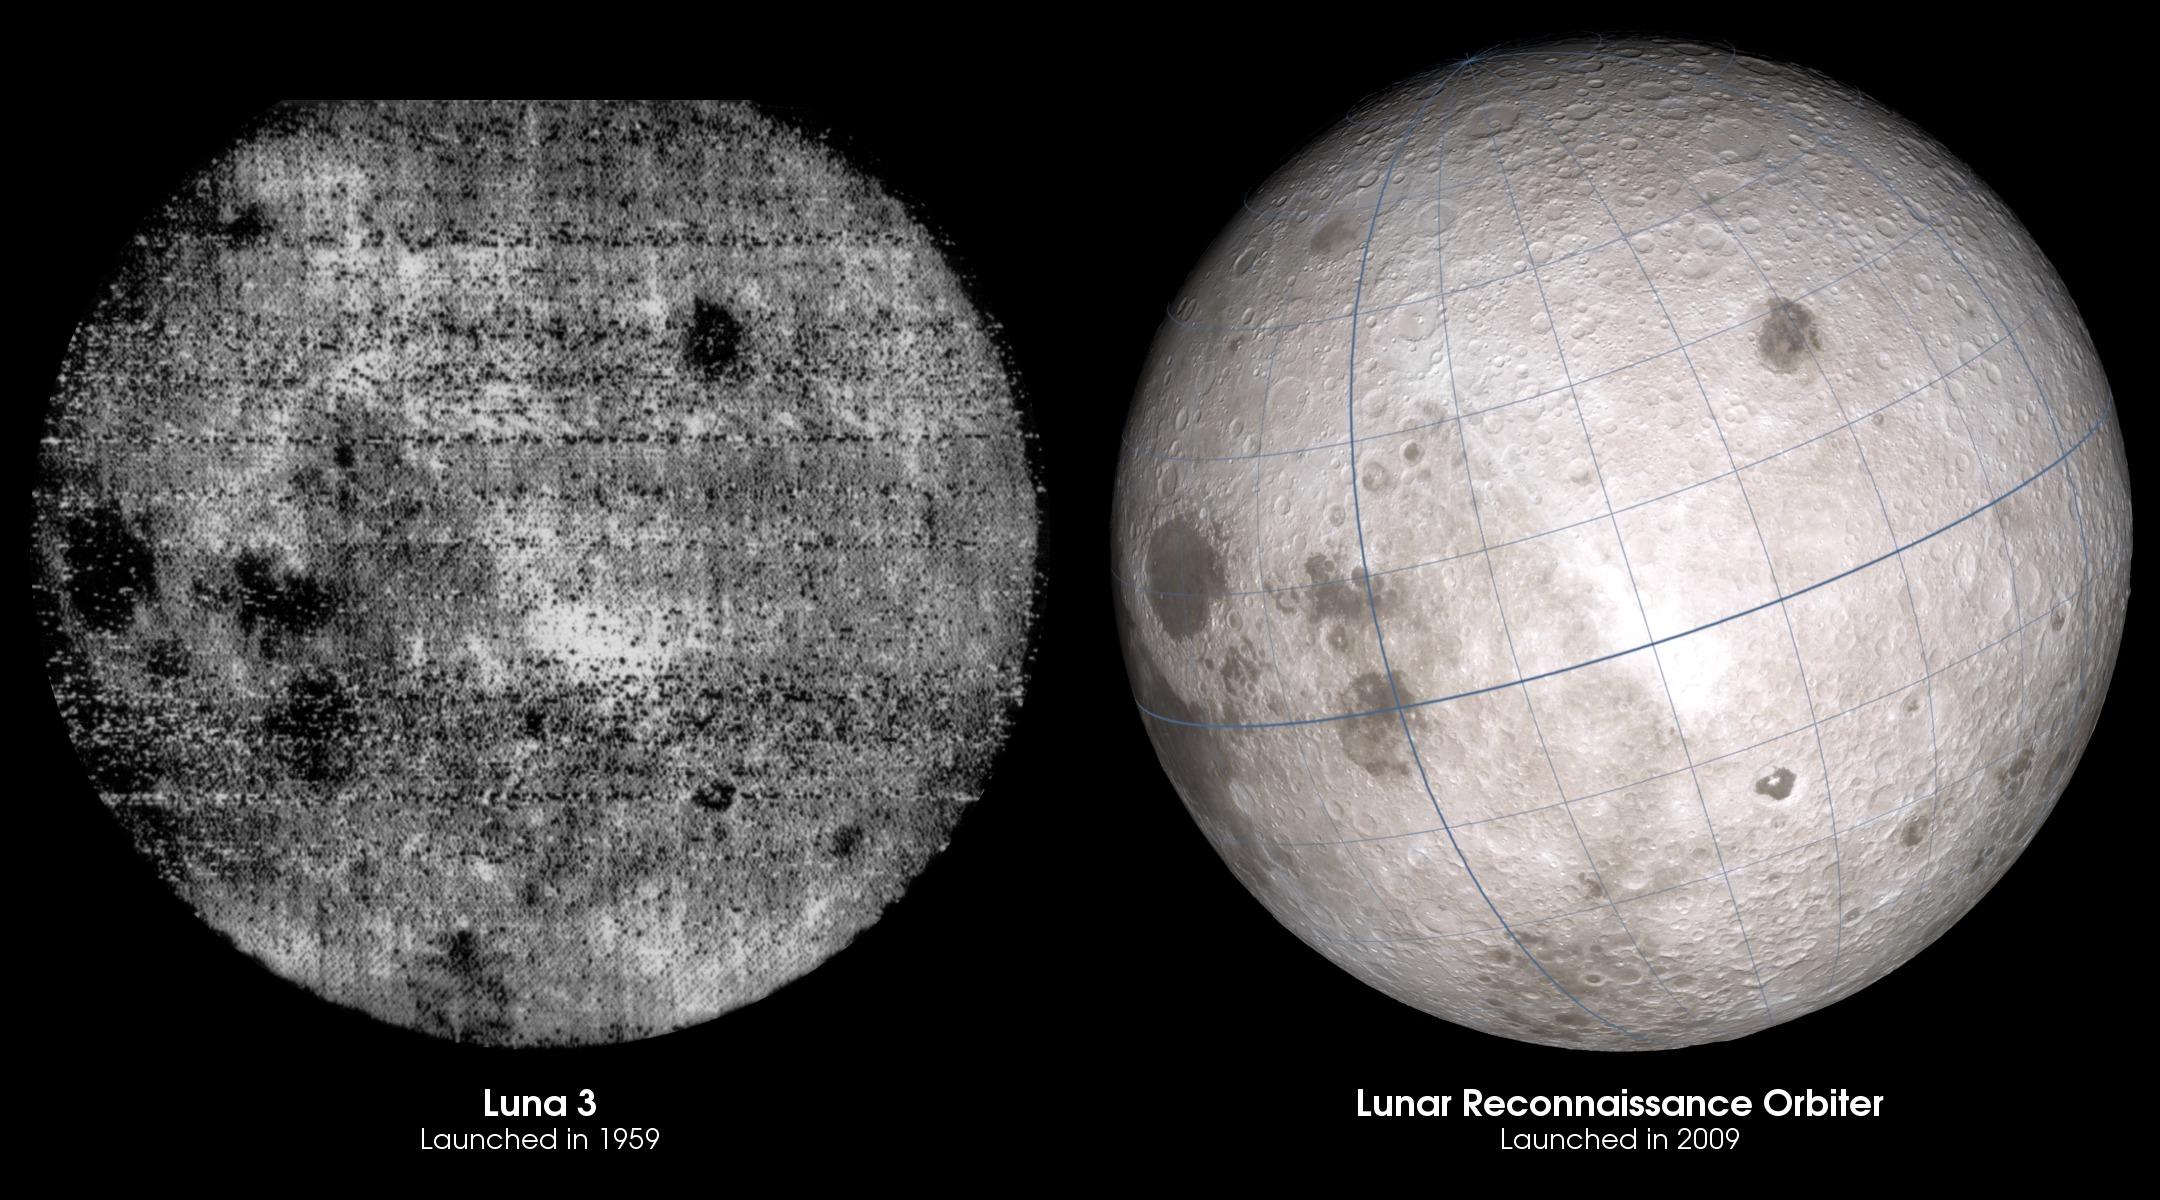 luna3_compare_grid.jpg